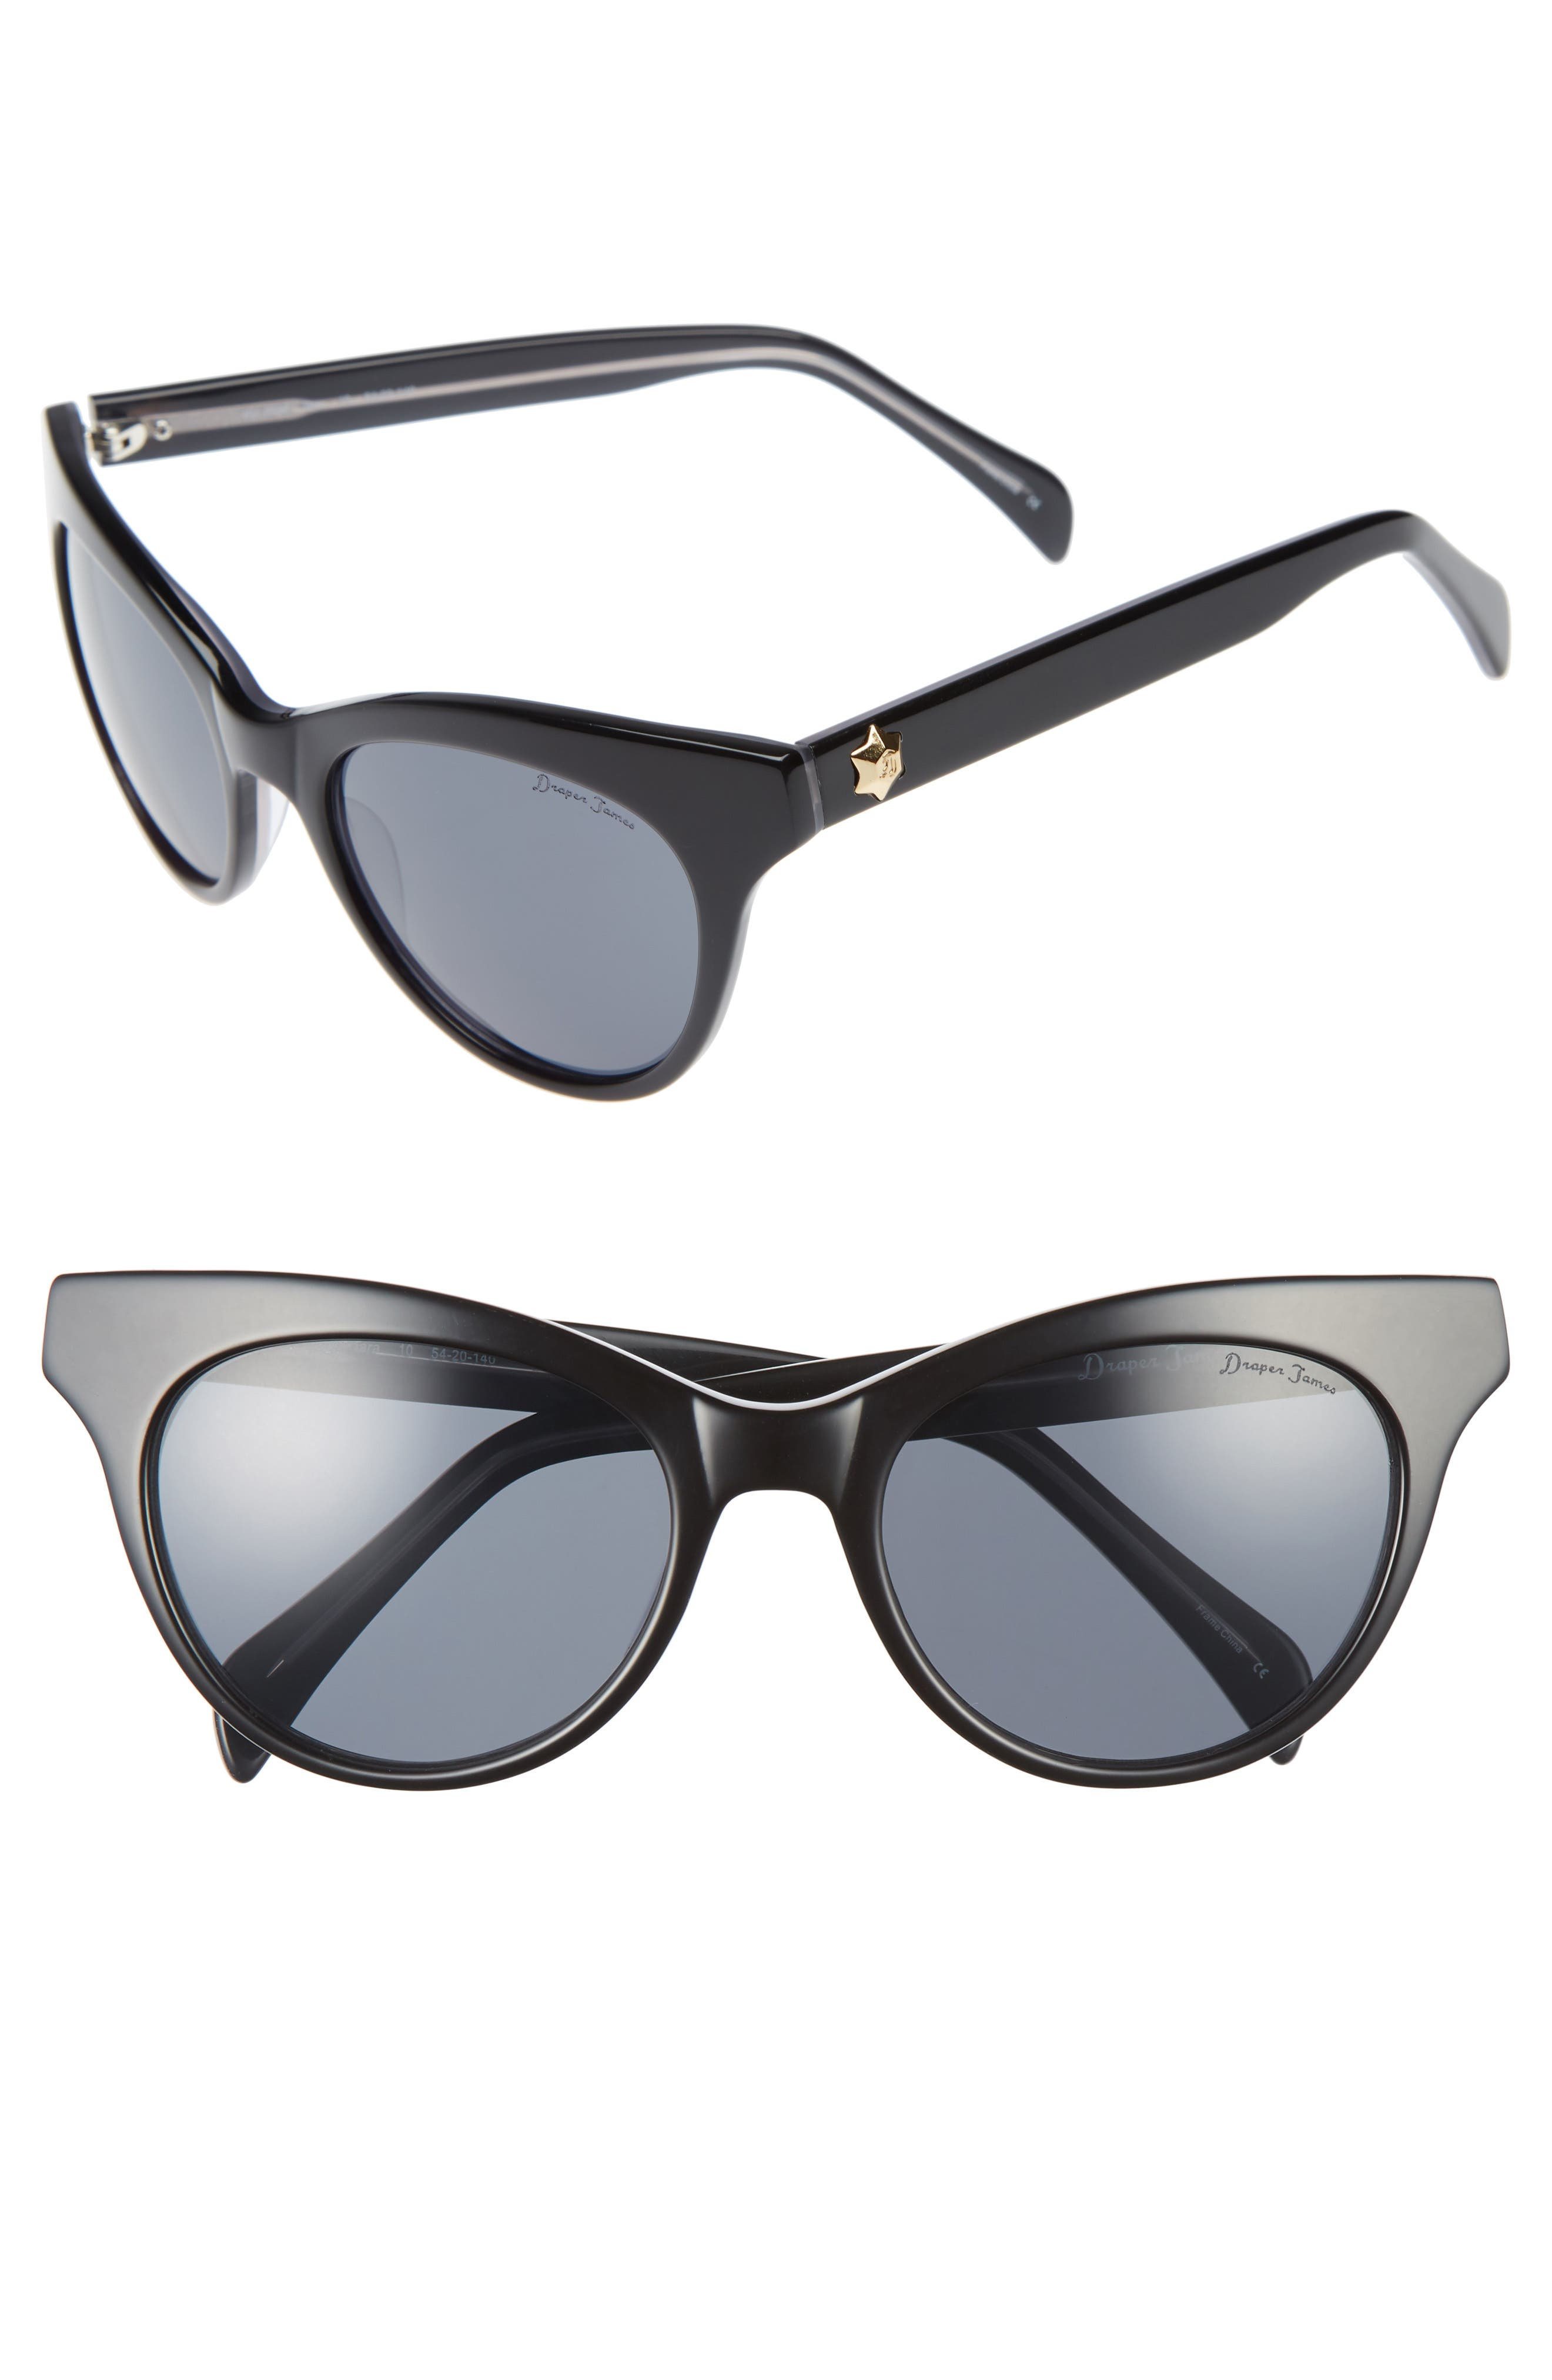 54mm Gradient Lens Cat Eye Sunglasses,                         Main,                         color, 001